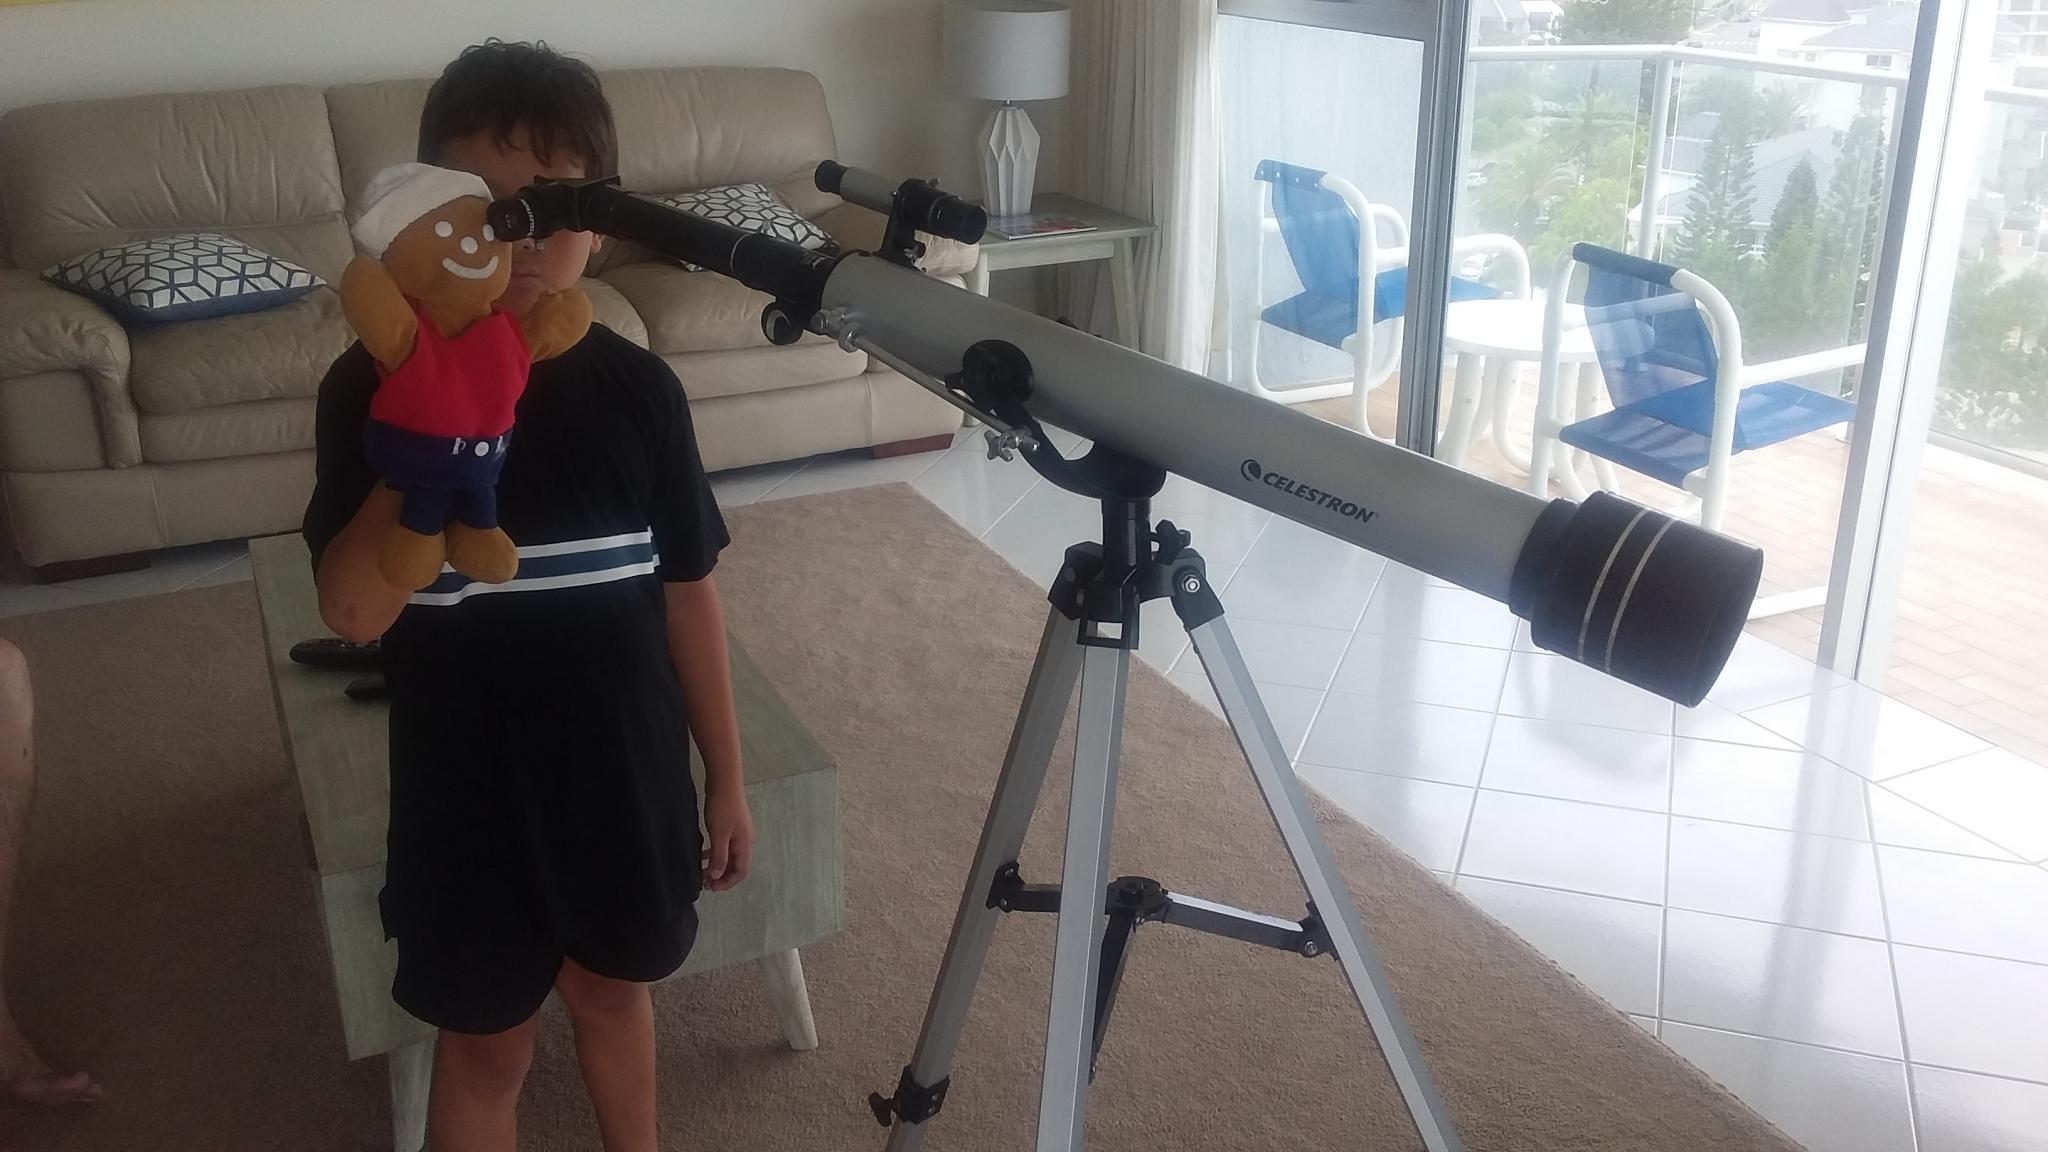 Recommend a telescope-20210220_121748-jpg